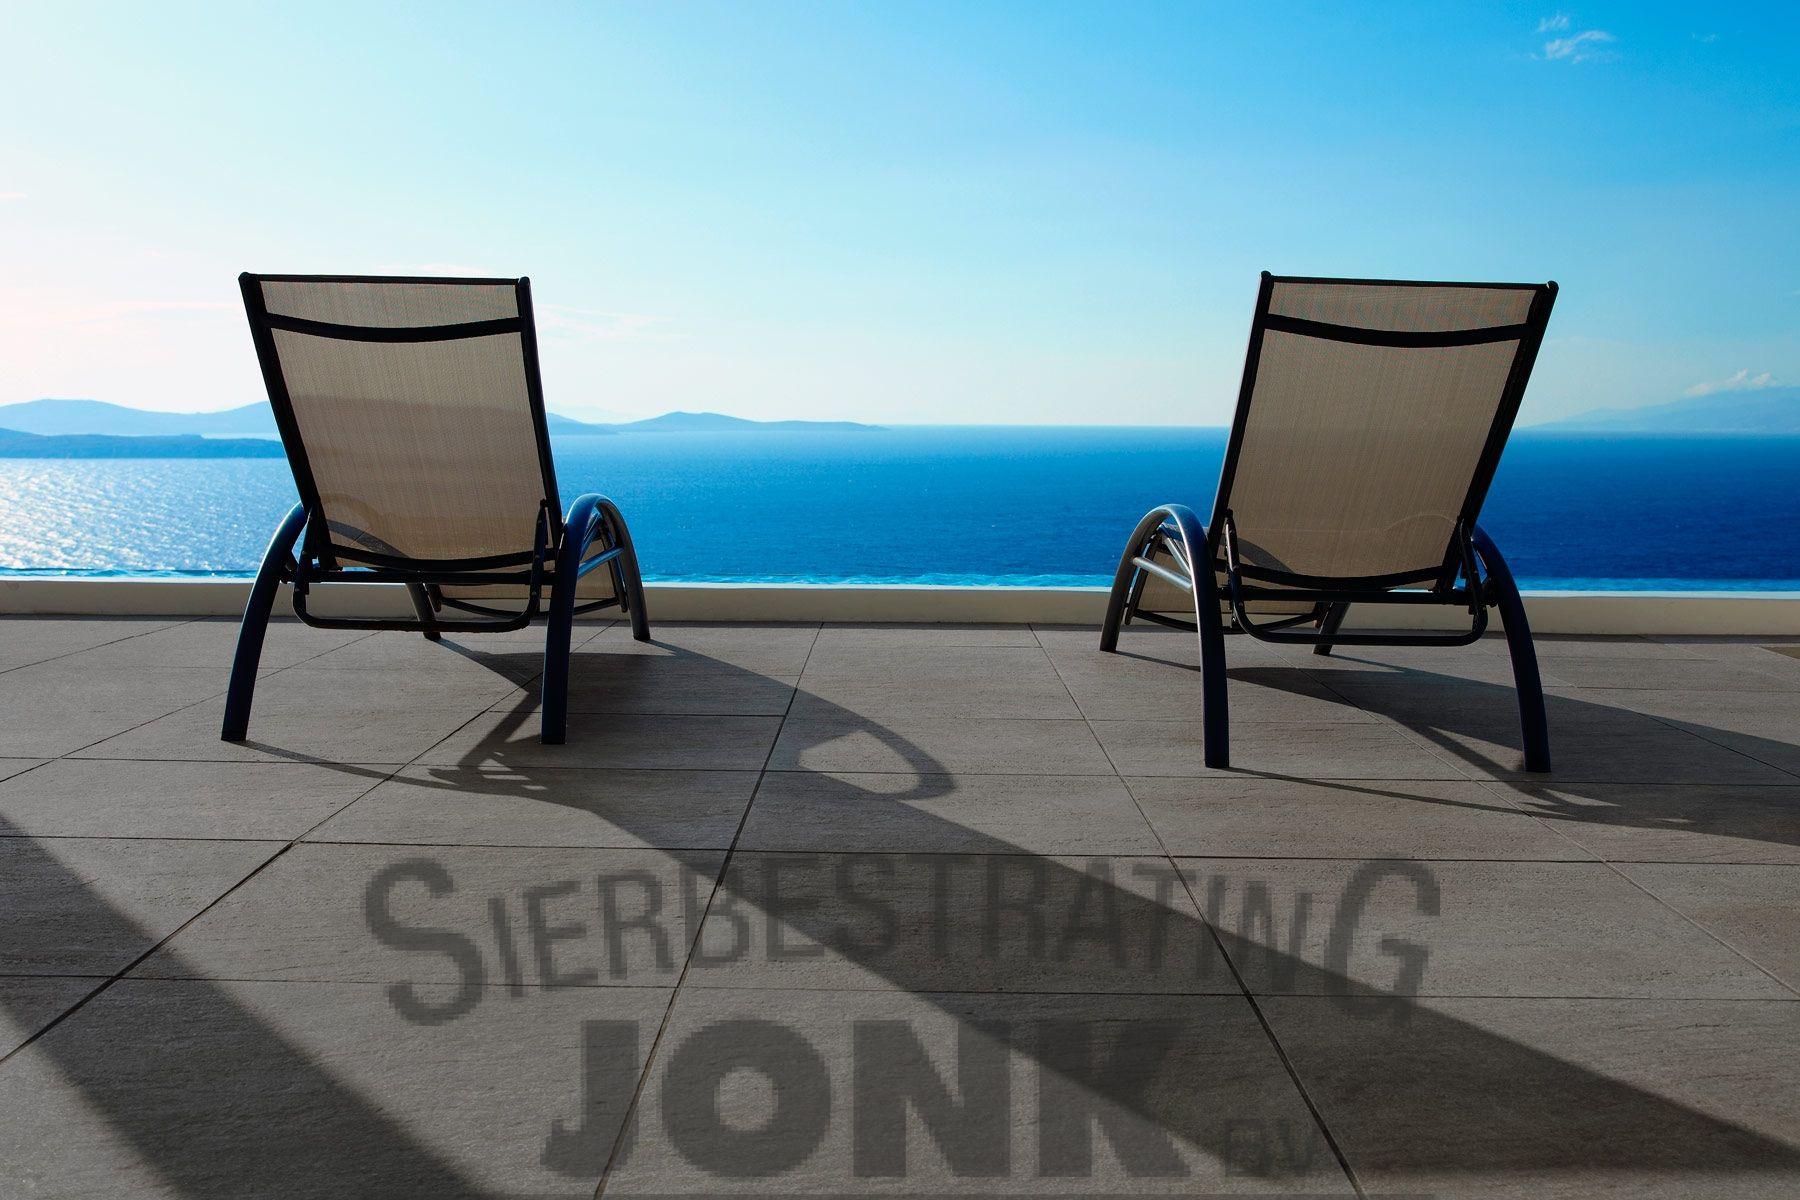 Supremo Antra 60x60x2cm - Jonk Sierbestrating, Edam, Almere, Schagen en Vijfhuizen